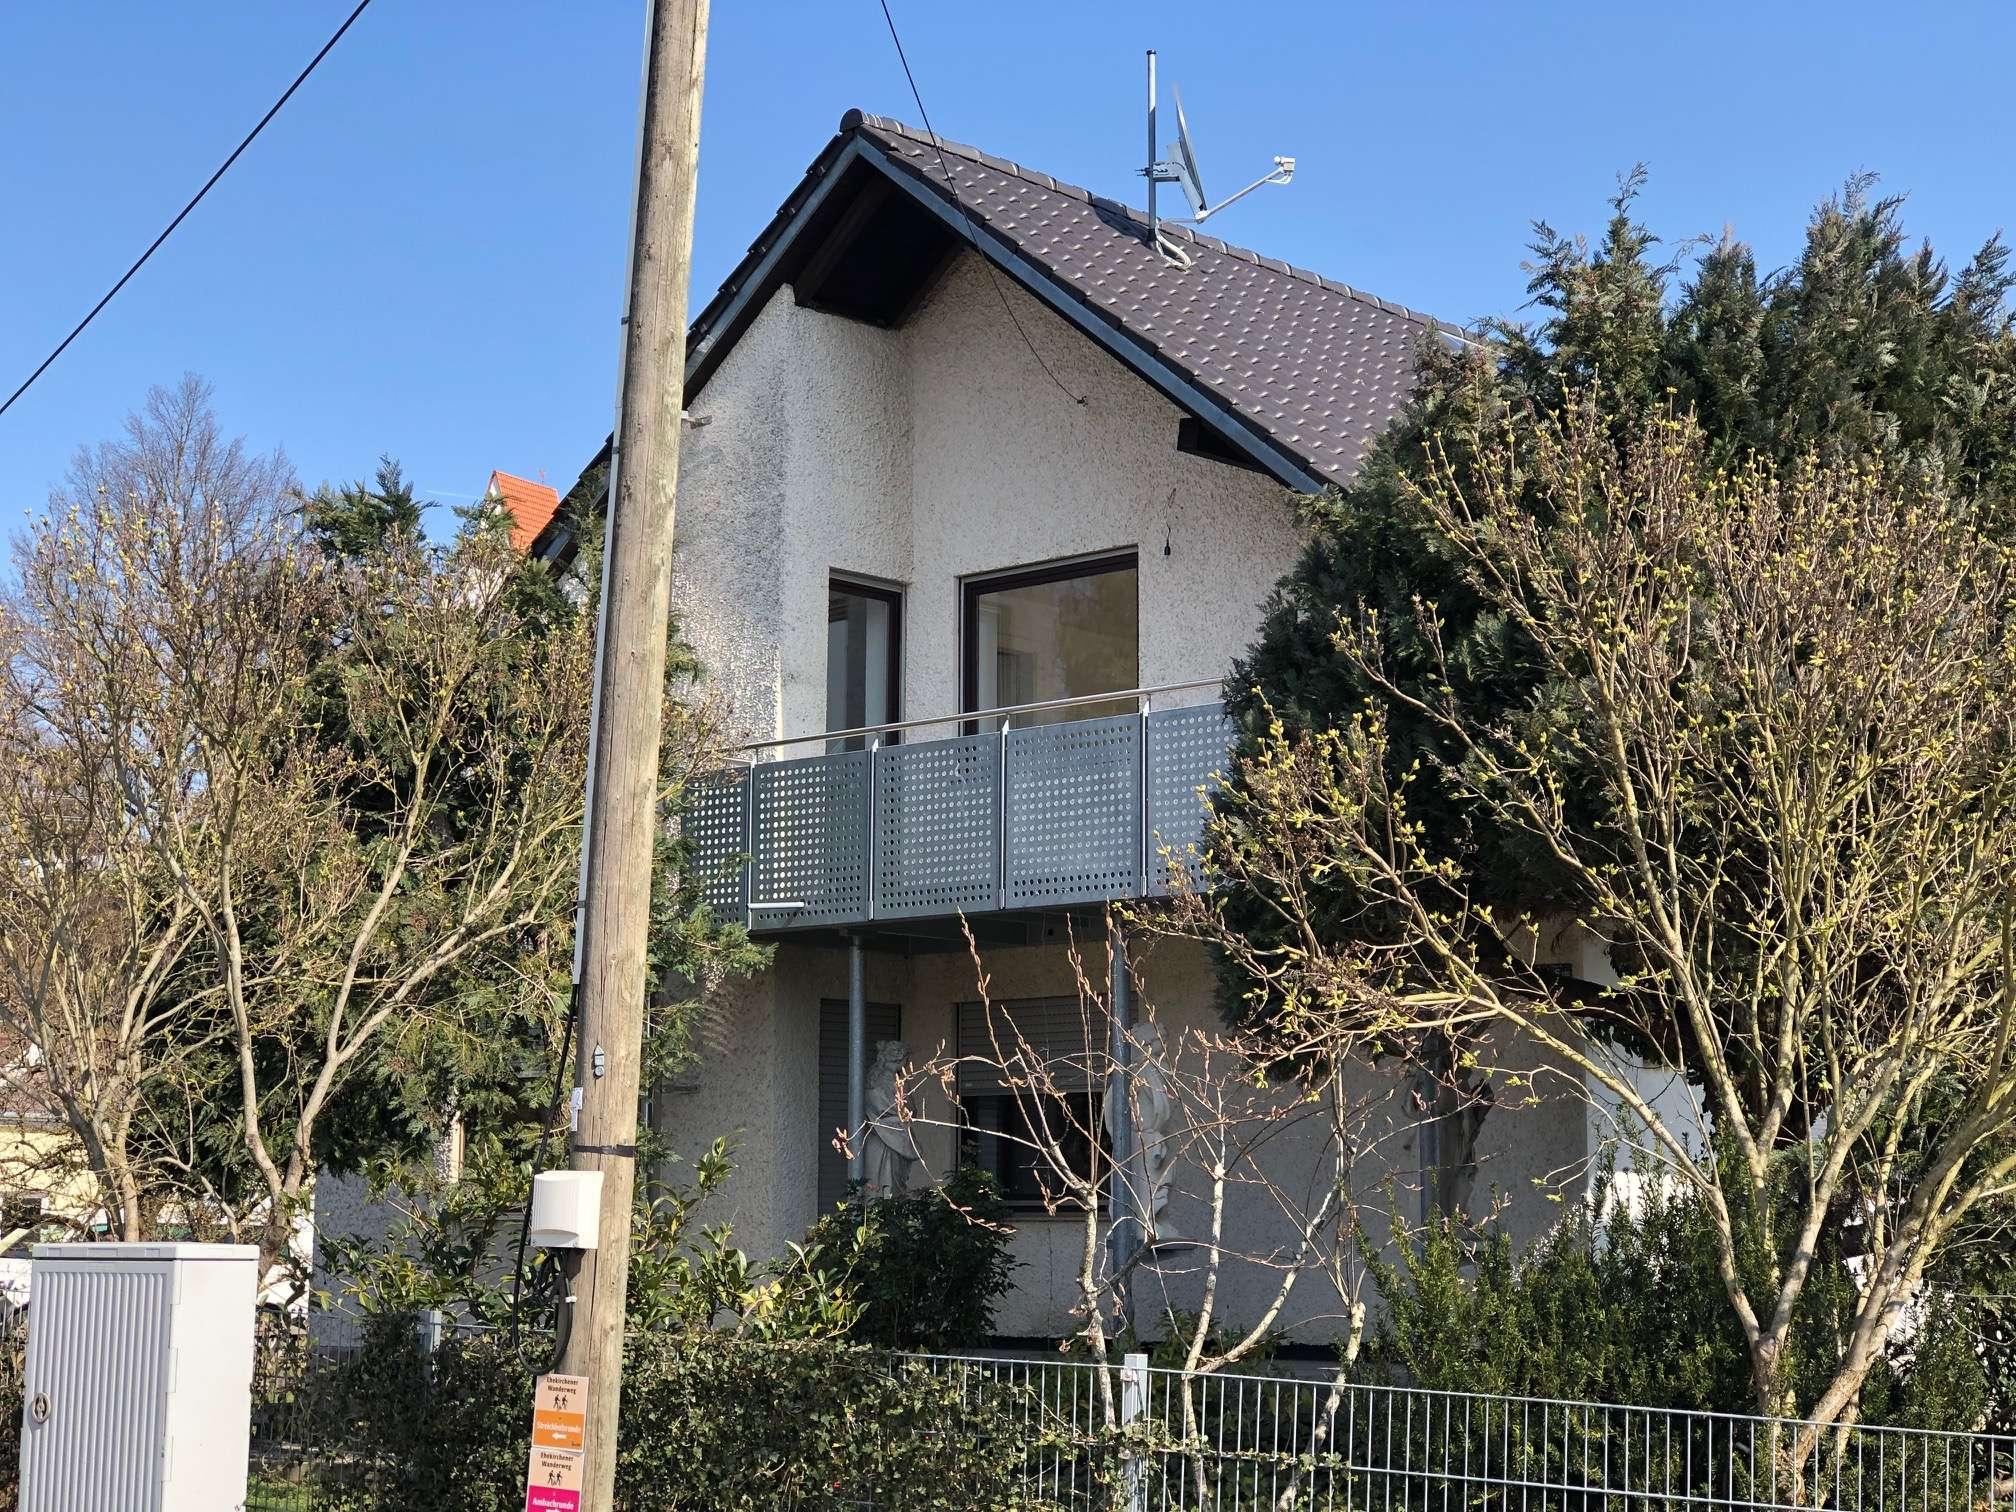 3-Zimmer-Dachgeschosswohnung mit Balkon